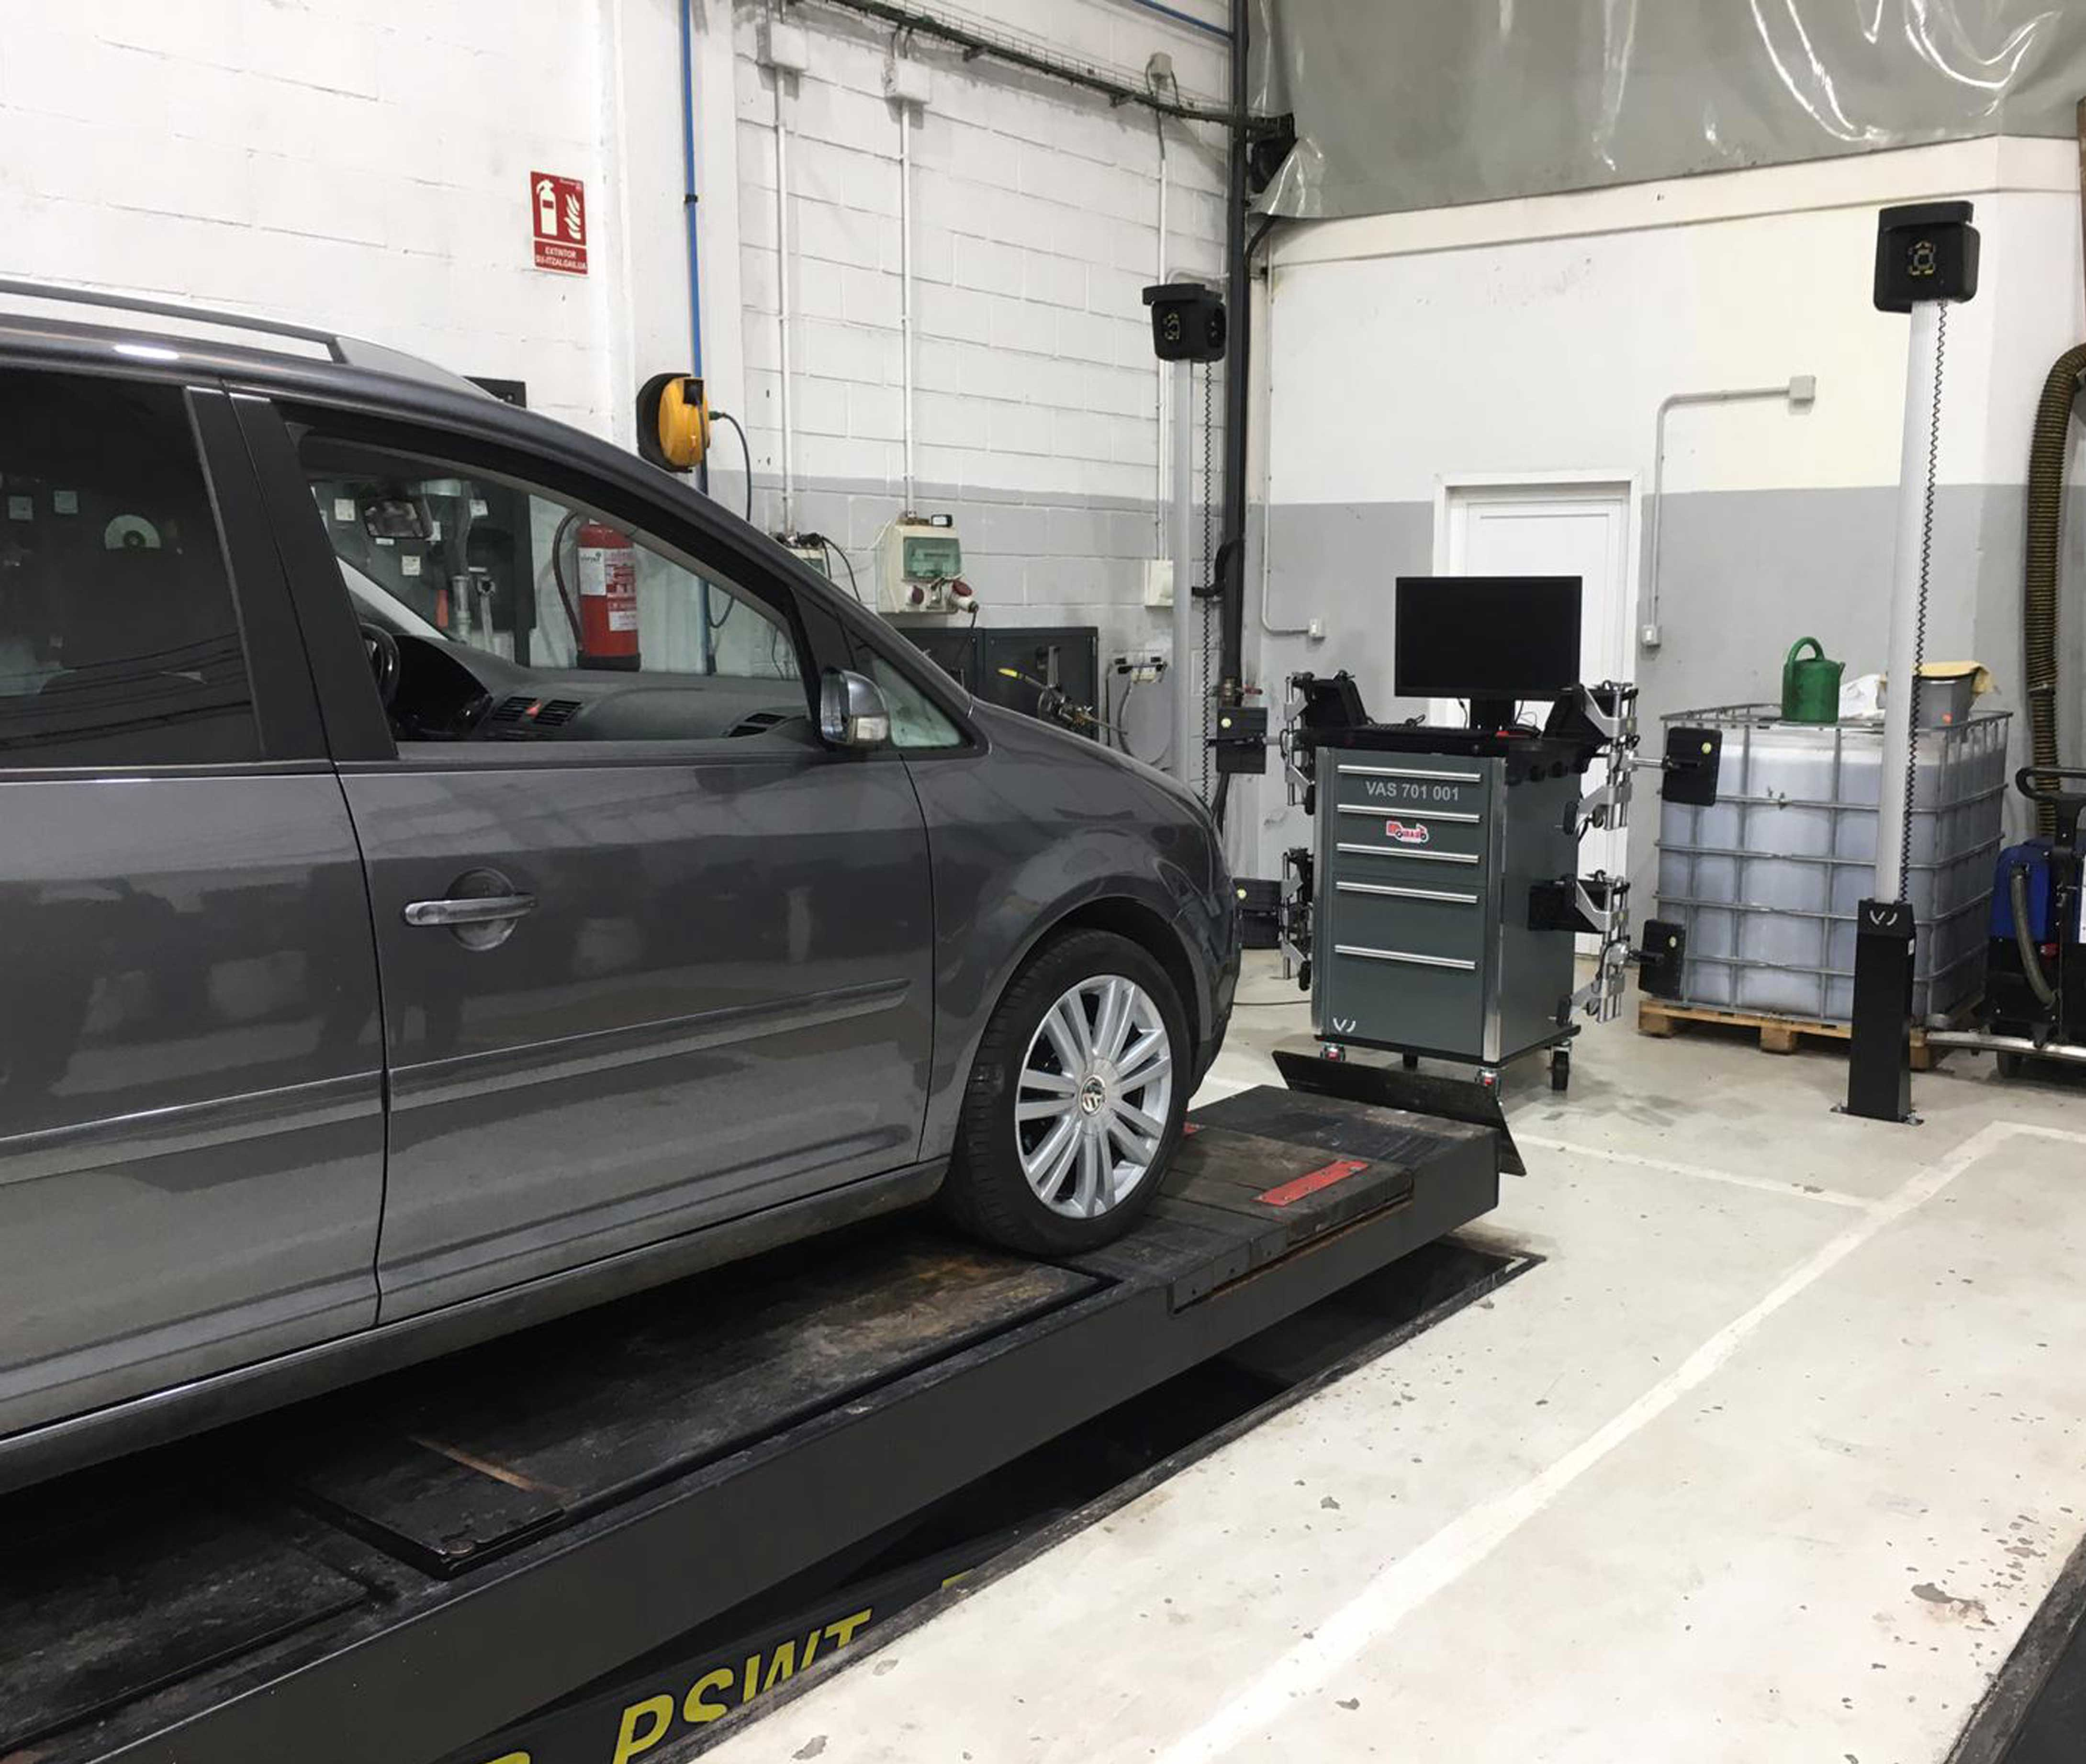 ALINEADOR HOMOLOGADO VW VAS 701 001